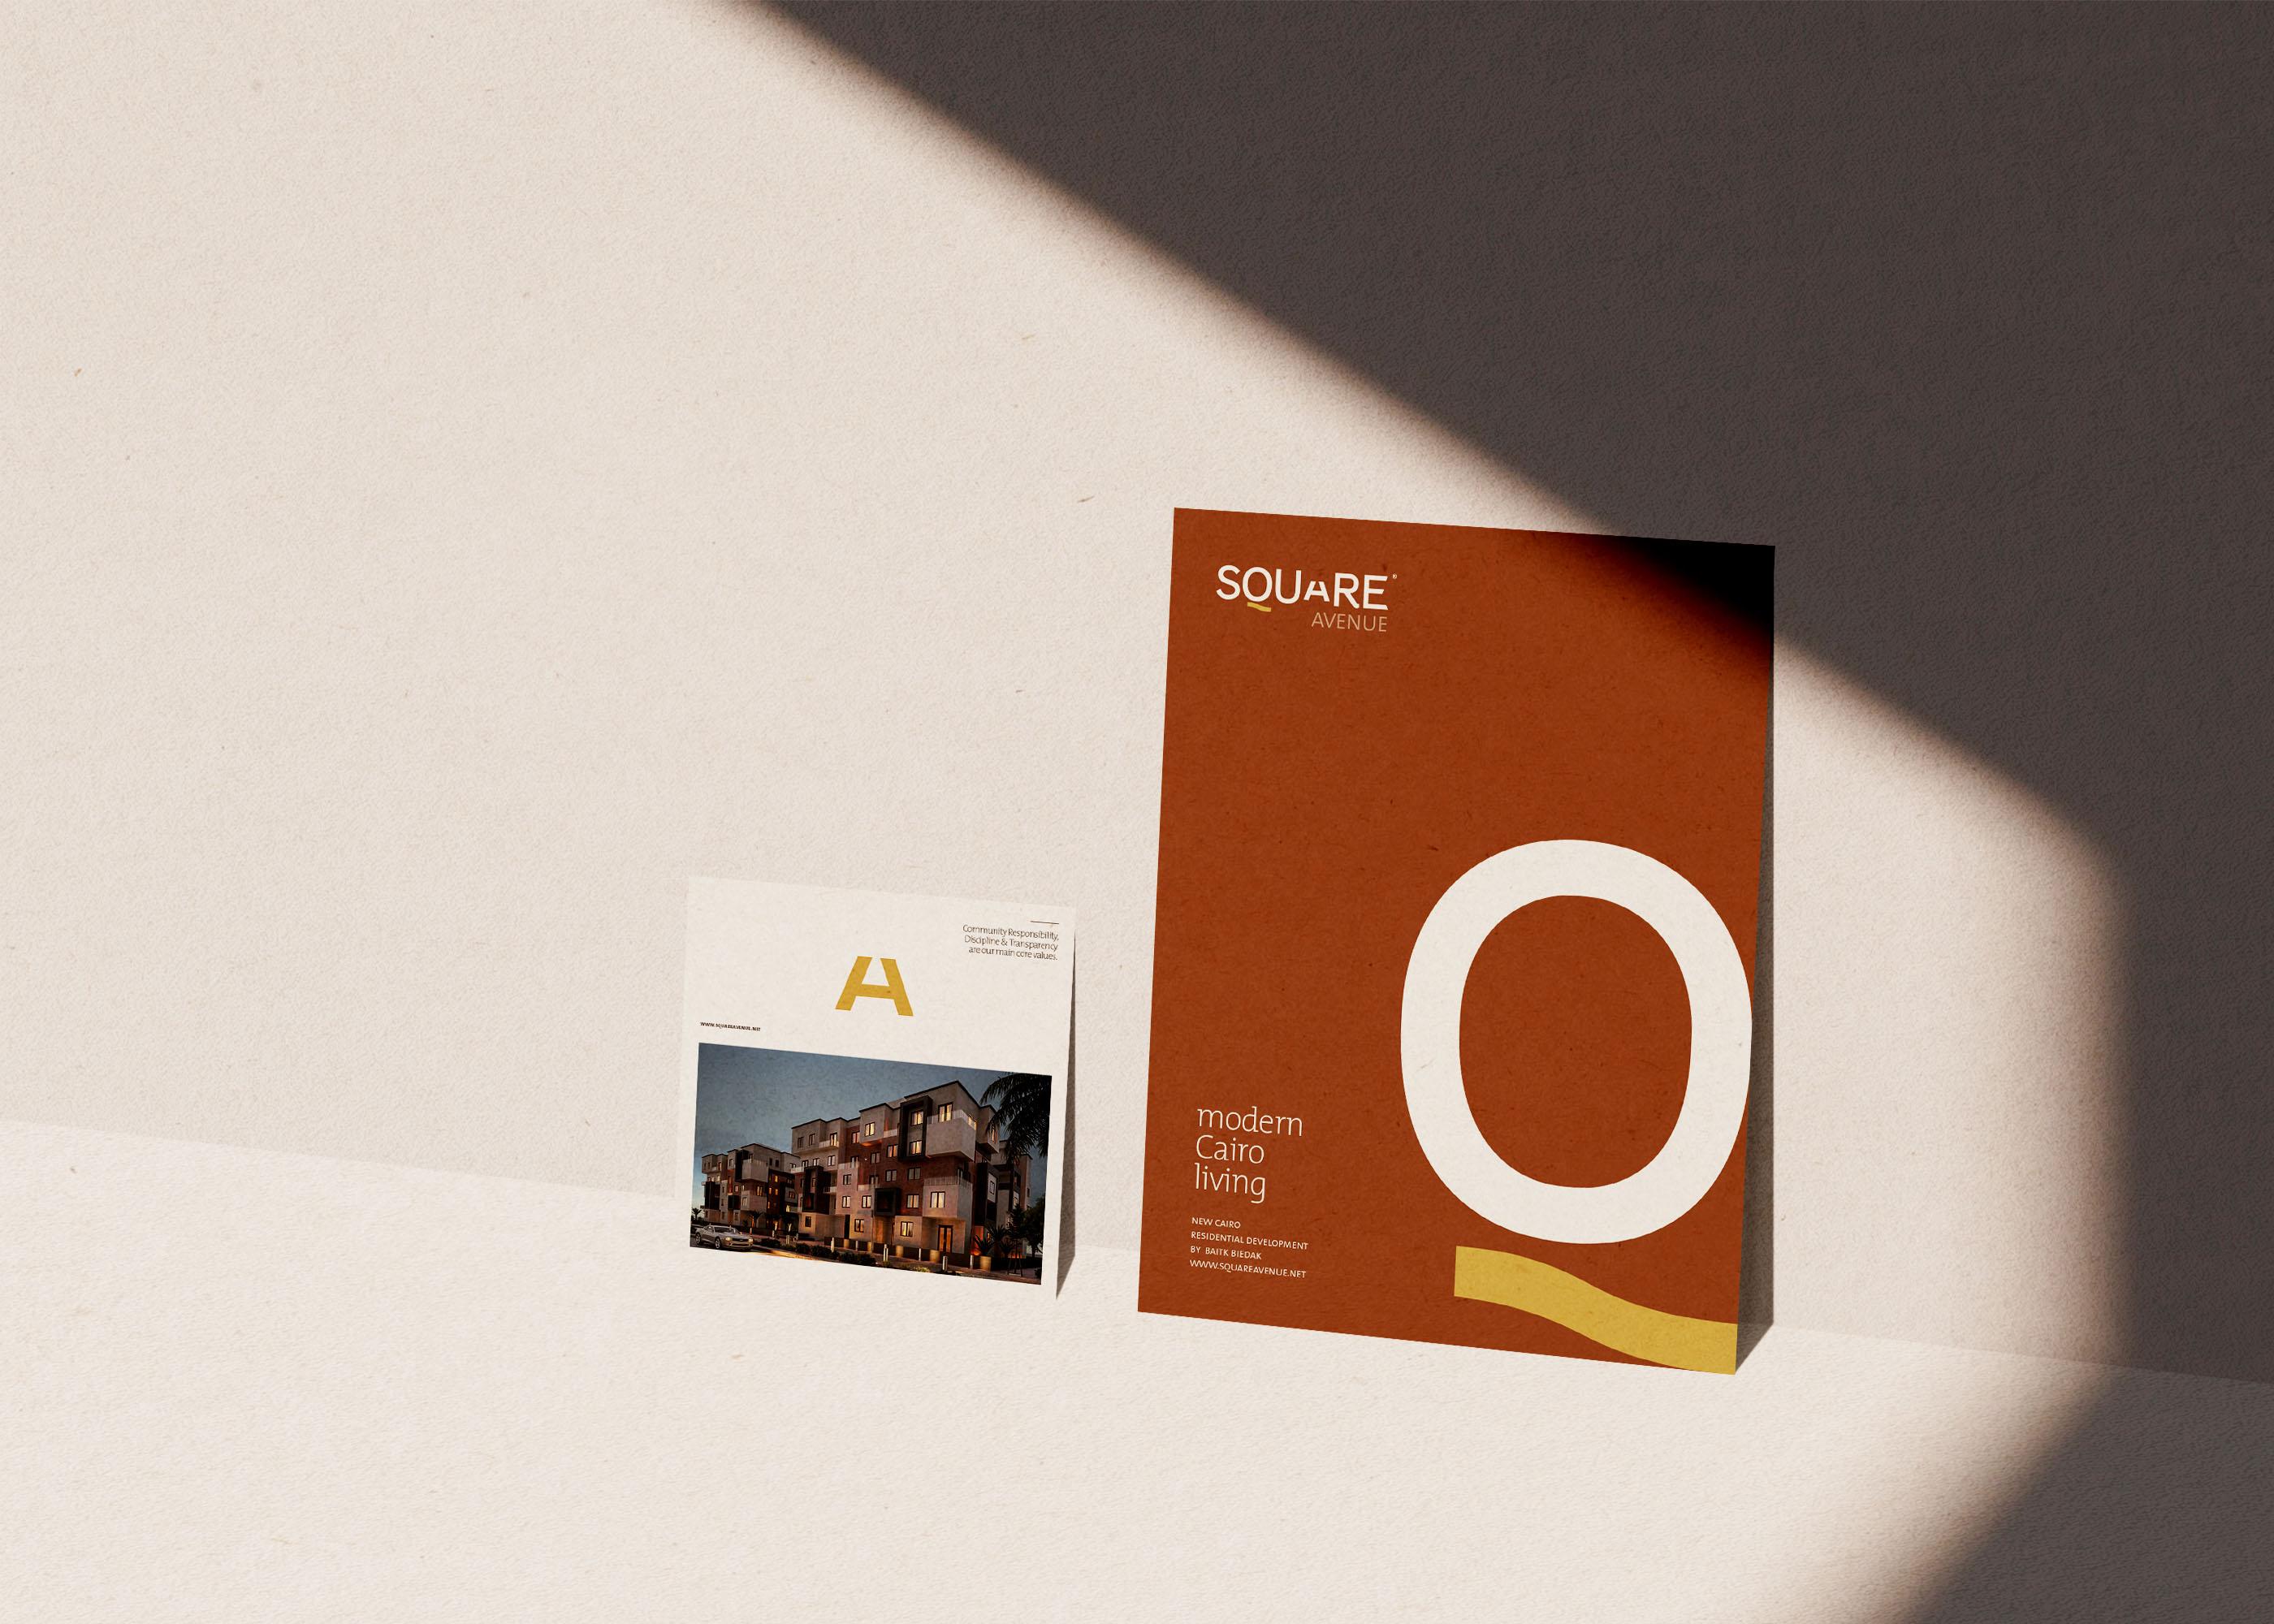 Visual Identity & Editorial Design for 'SQUARE AVENUE' Residential Development